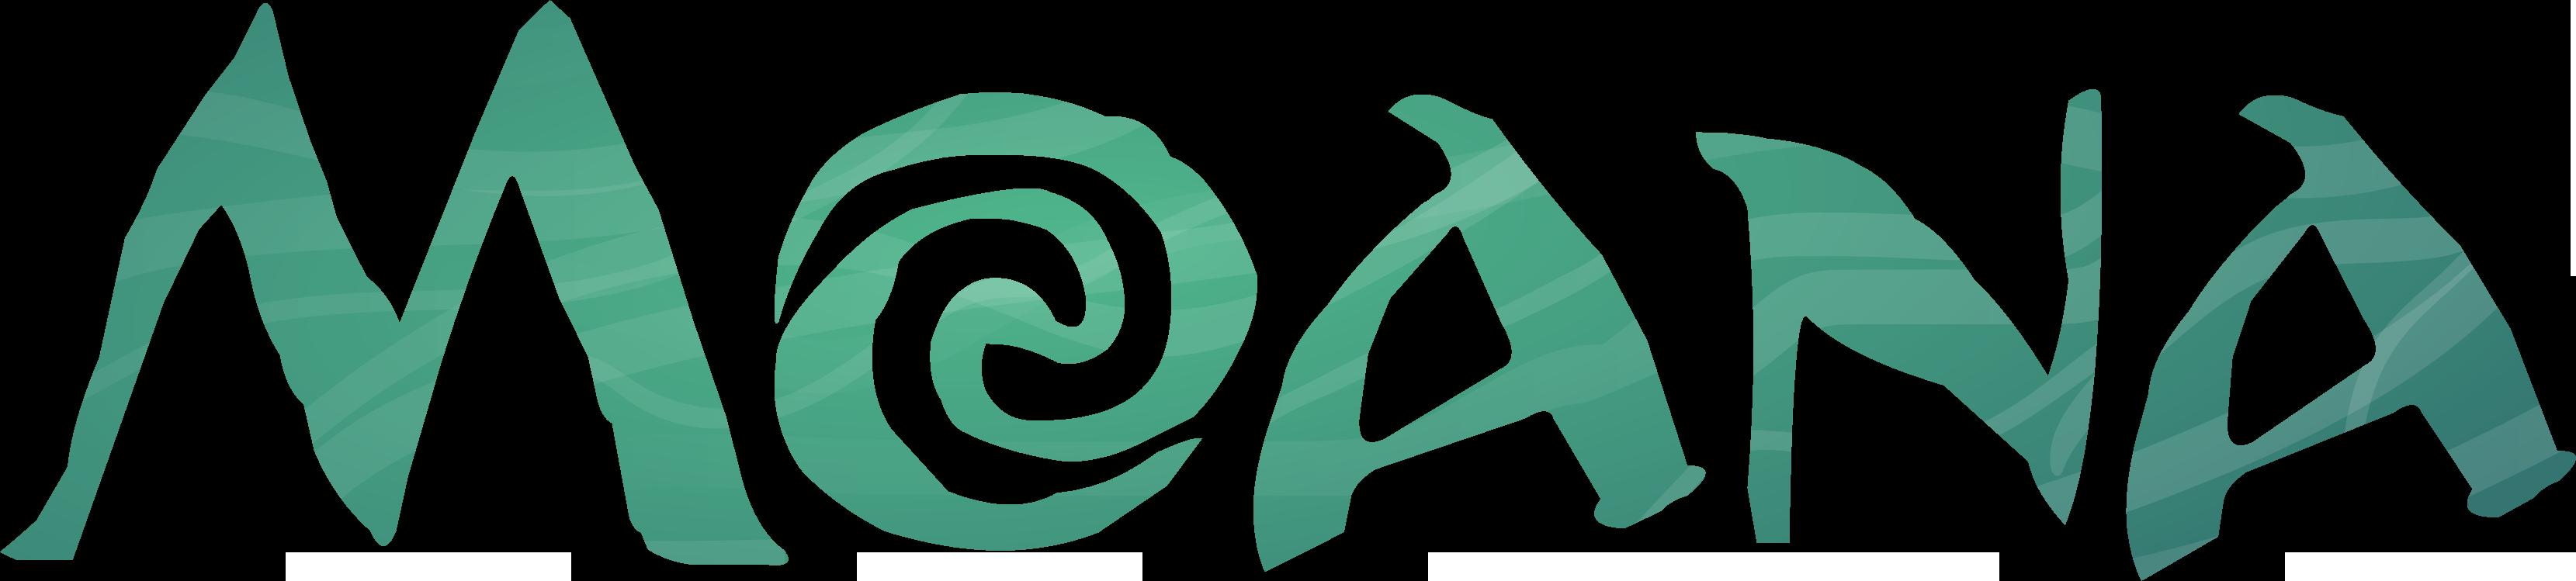 Kakamora wikia fandom powered. Moana clipart organism